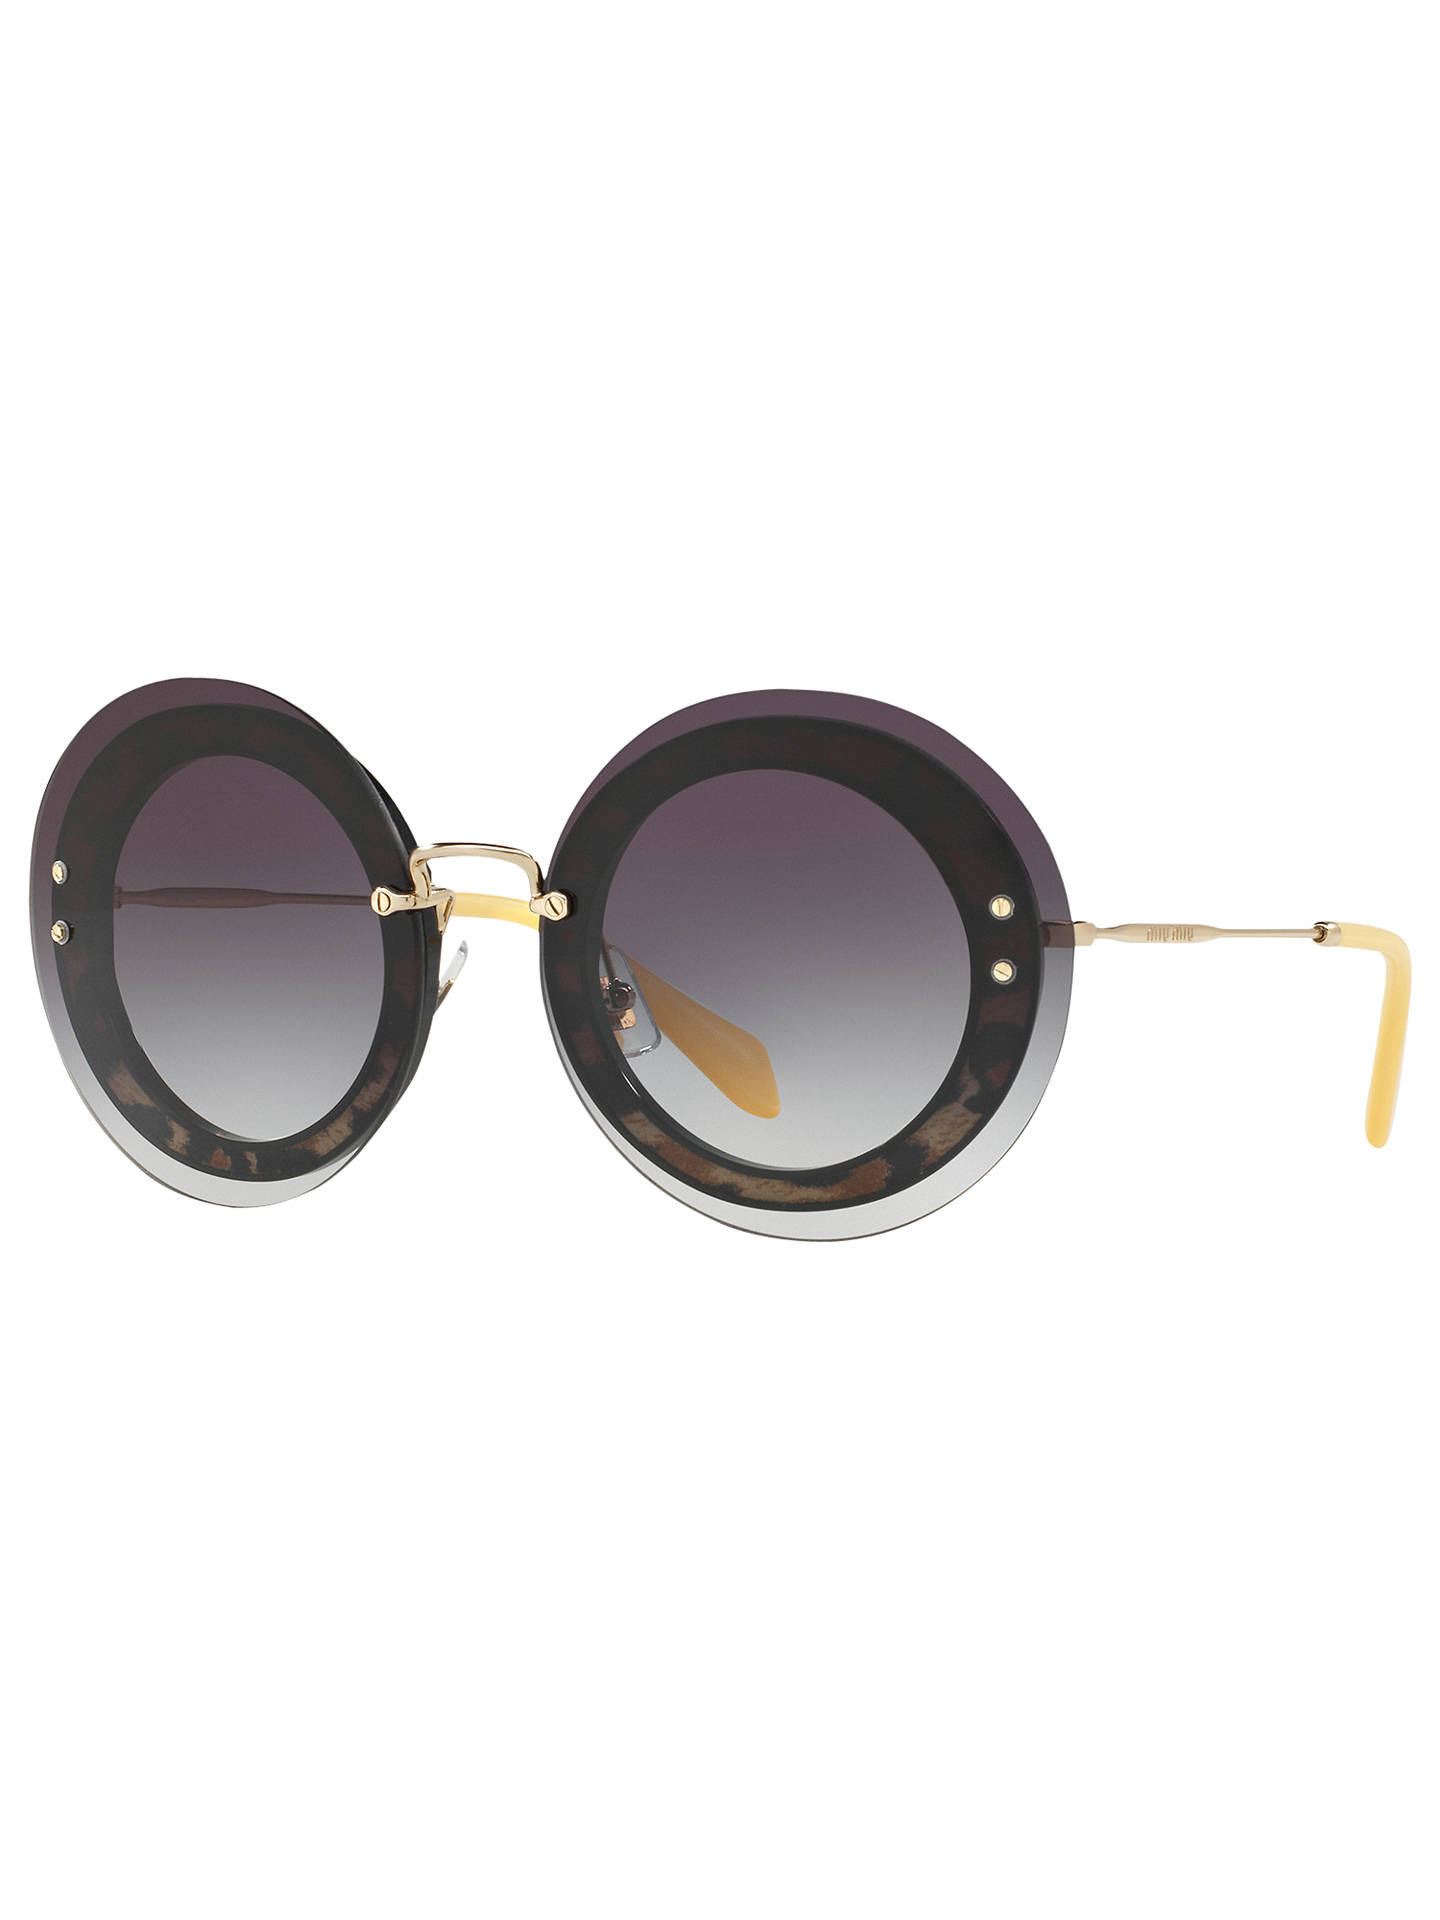 155251a53286 Buy Miu Miu MU 10RS Round Sunglasses, Black/Grey Gradient Online at  johnlewis.